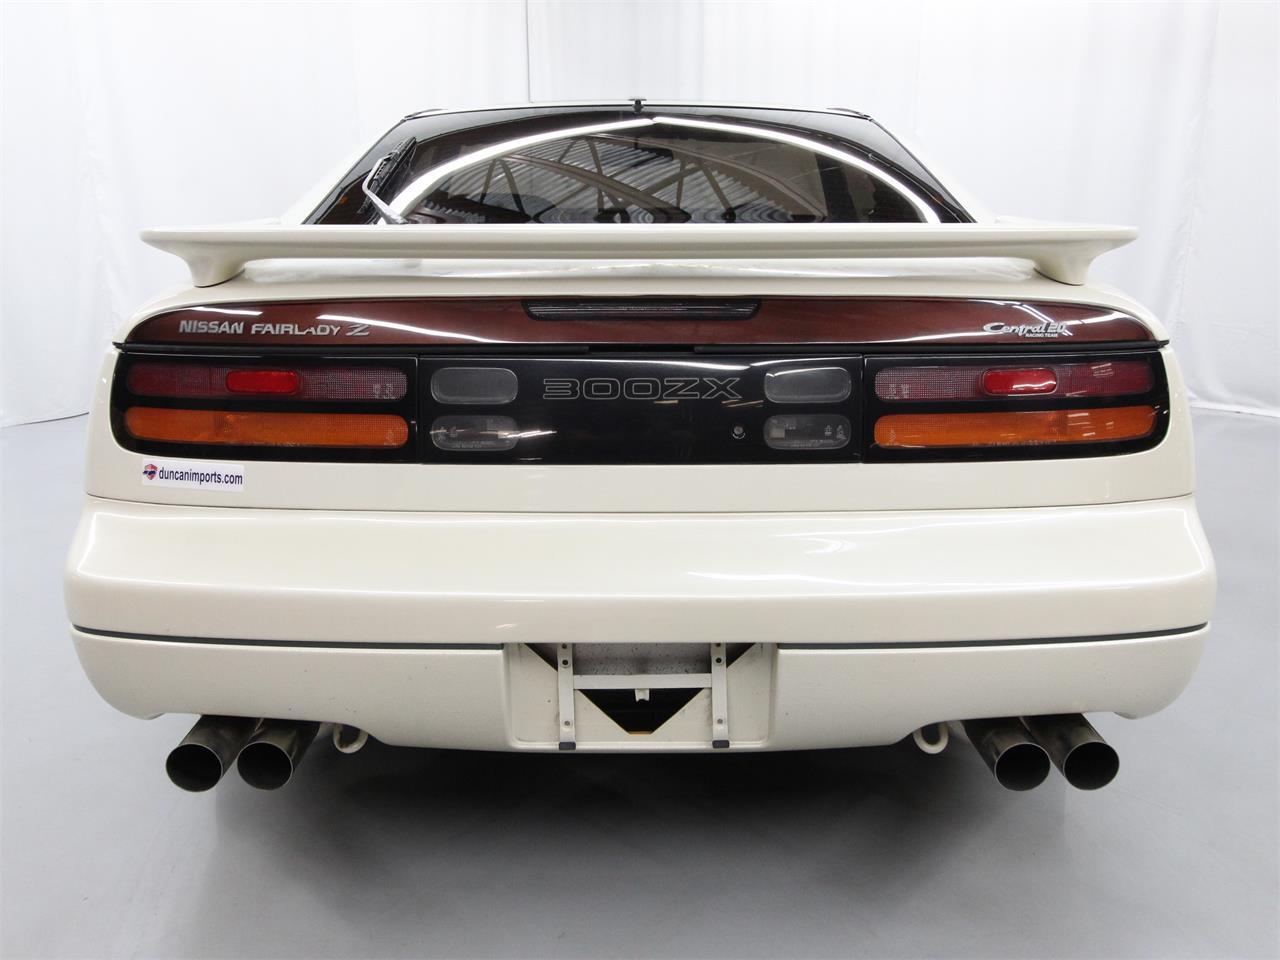 1993 Nissan Fairlady (CC-1236847) for sale in Christiansburg, Virginia